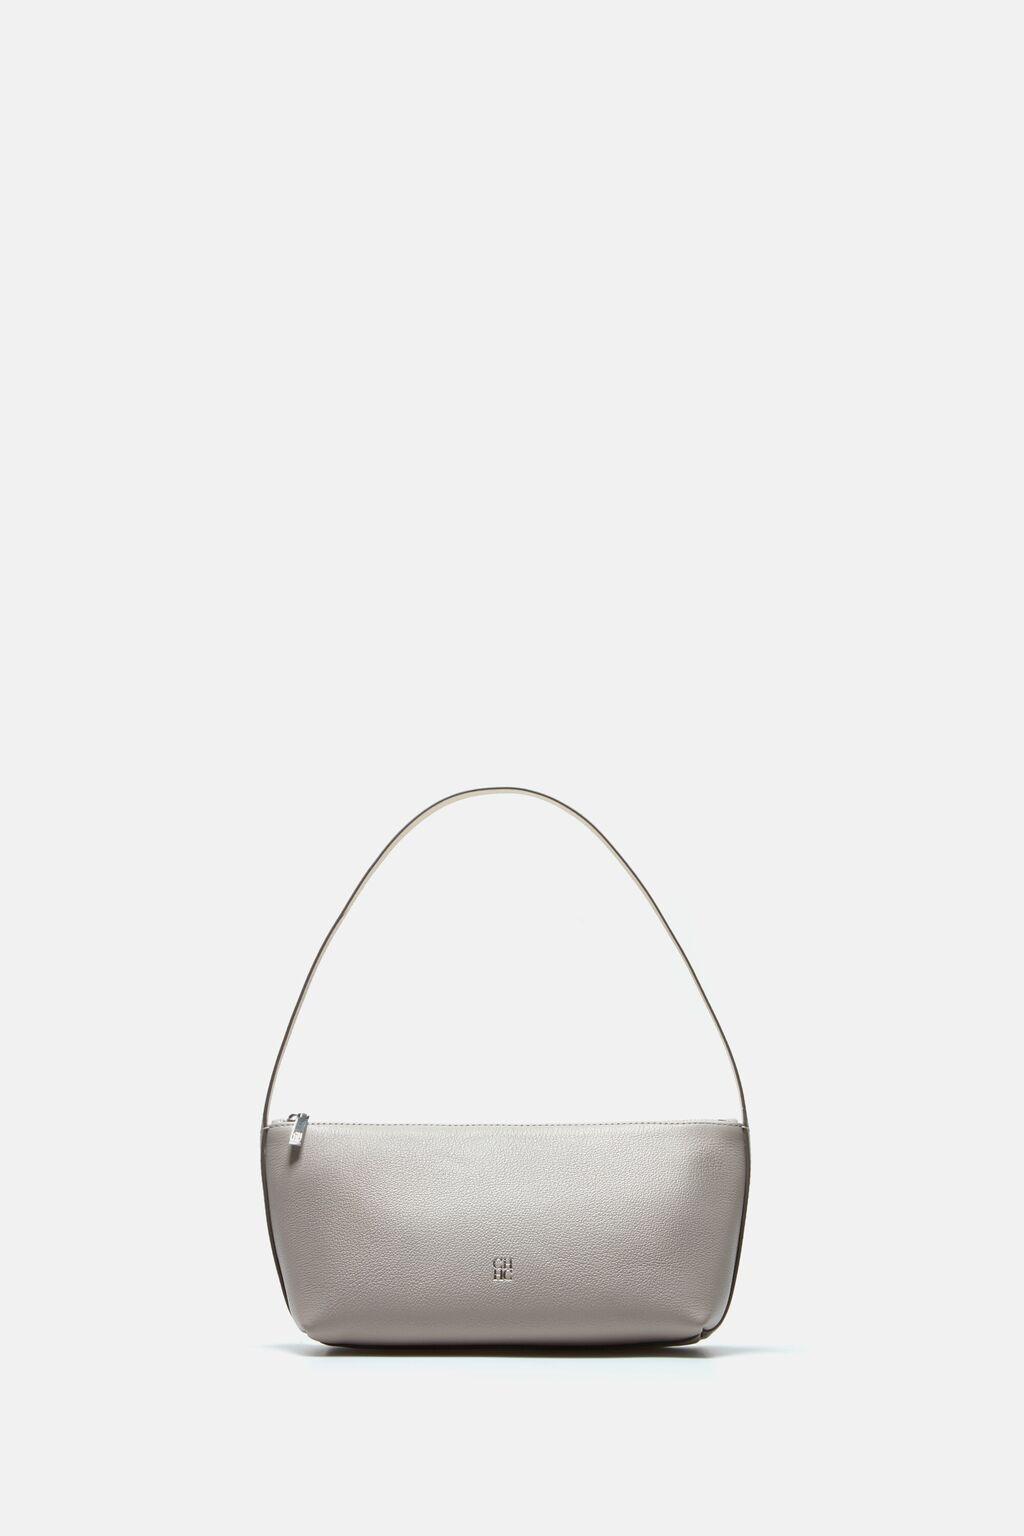 Lipstick | Small shoulder bag